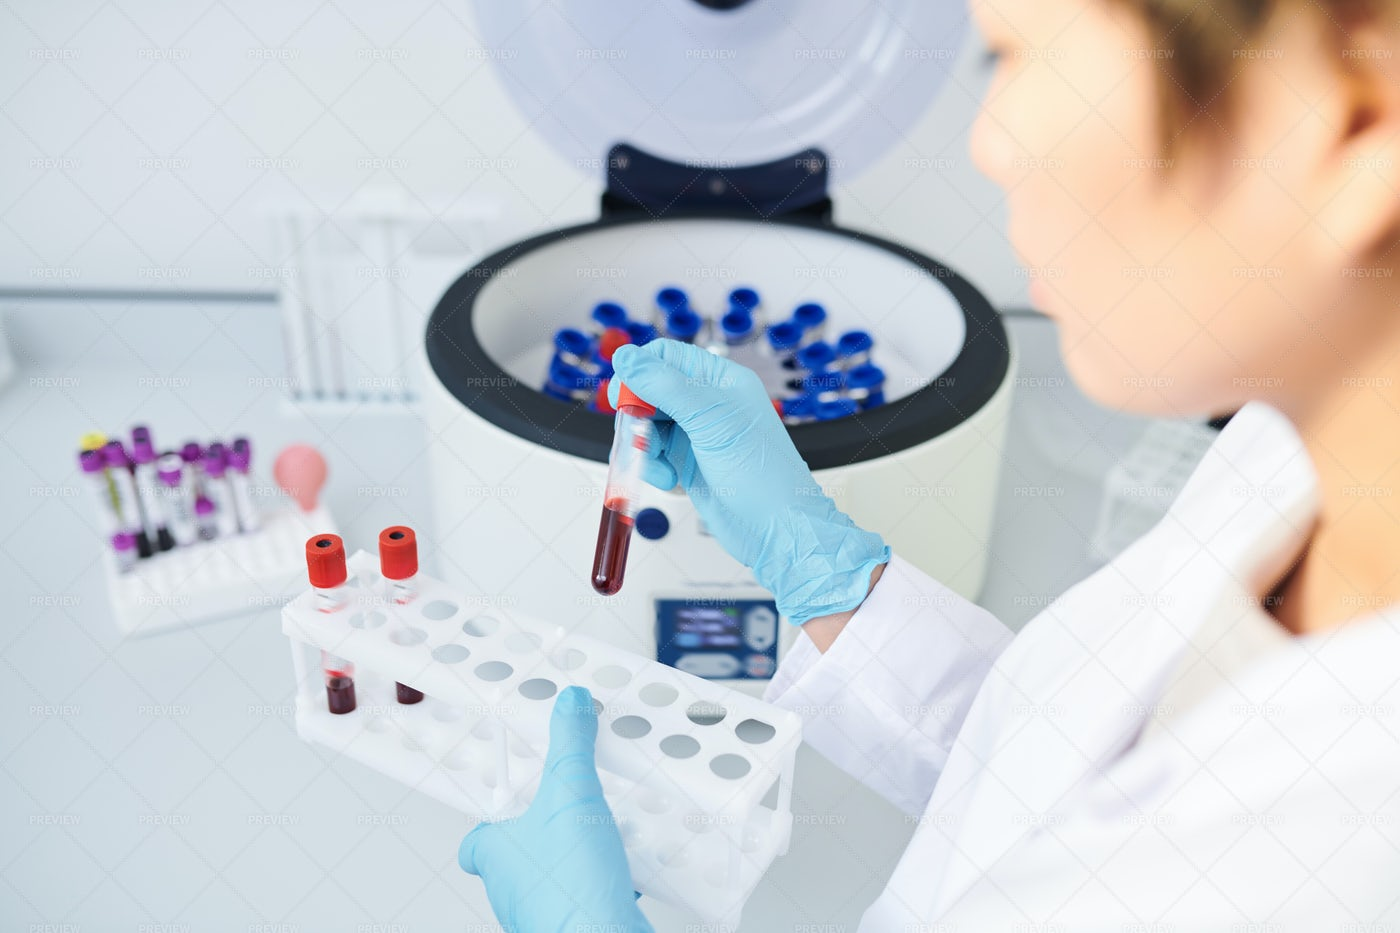 Preparing Blood Samples For...: Stock Photos